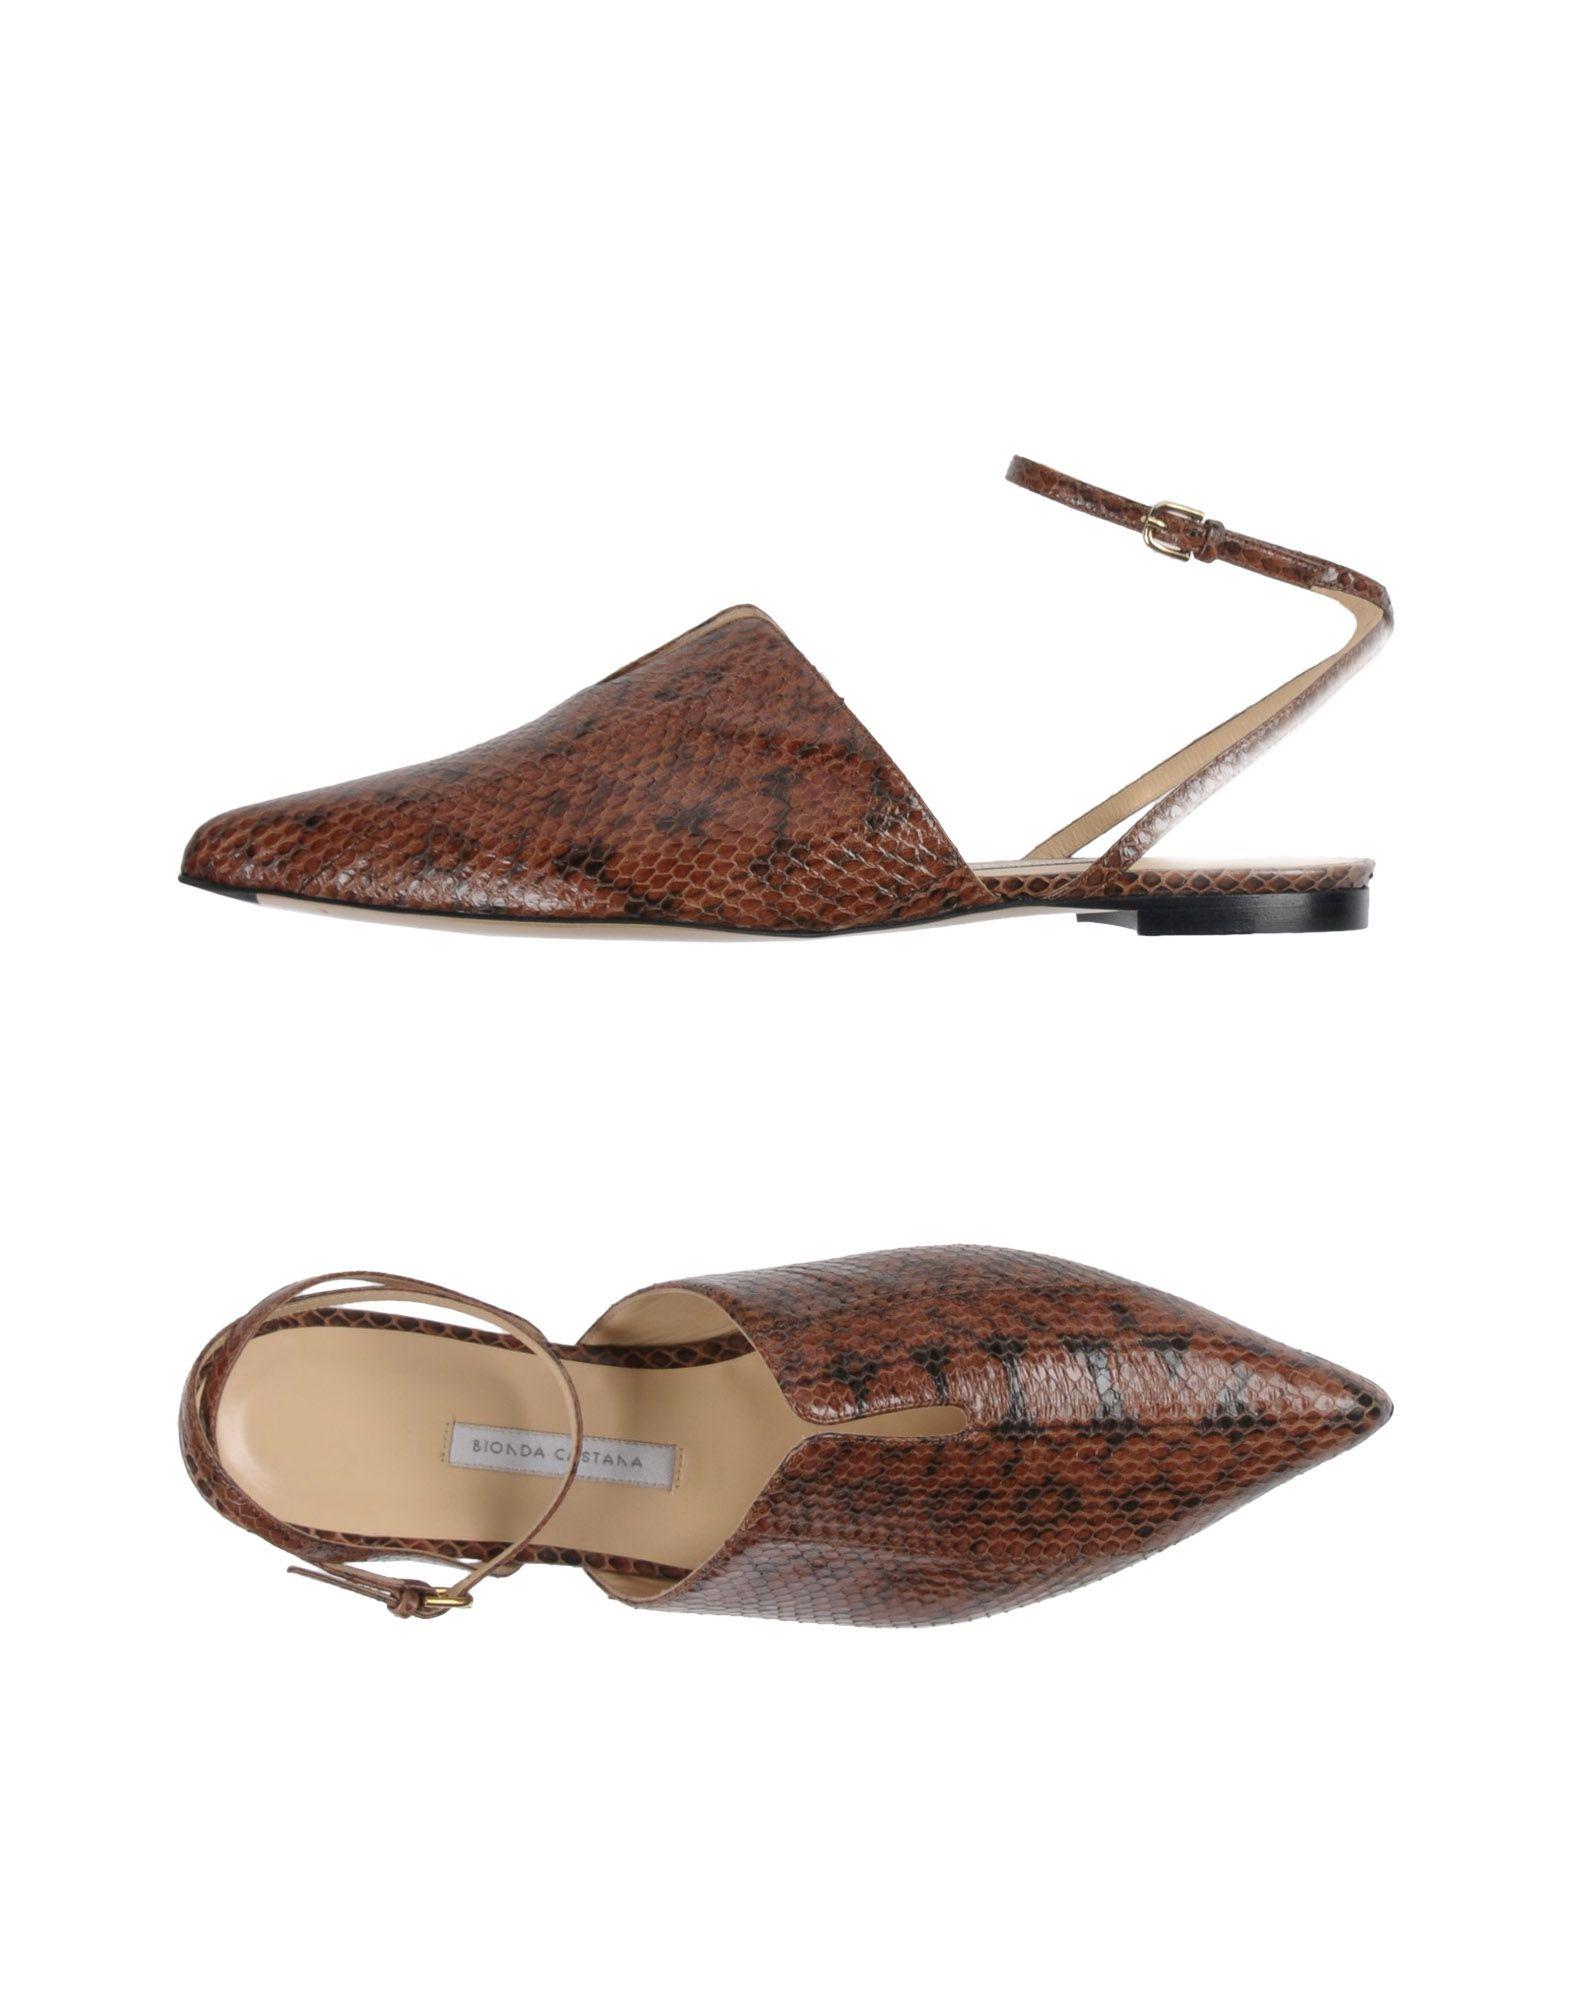 Bionda Castana Ballerinas Damen  11282464DW Gute Qualität beliebte Schuhe